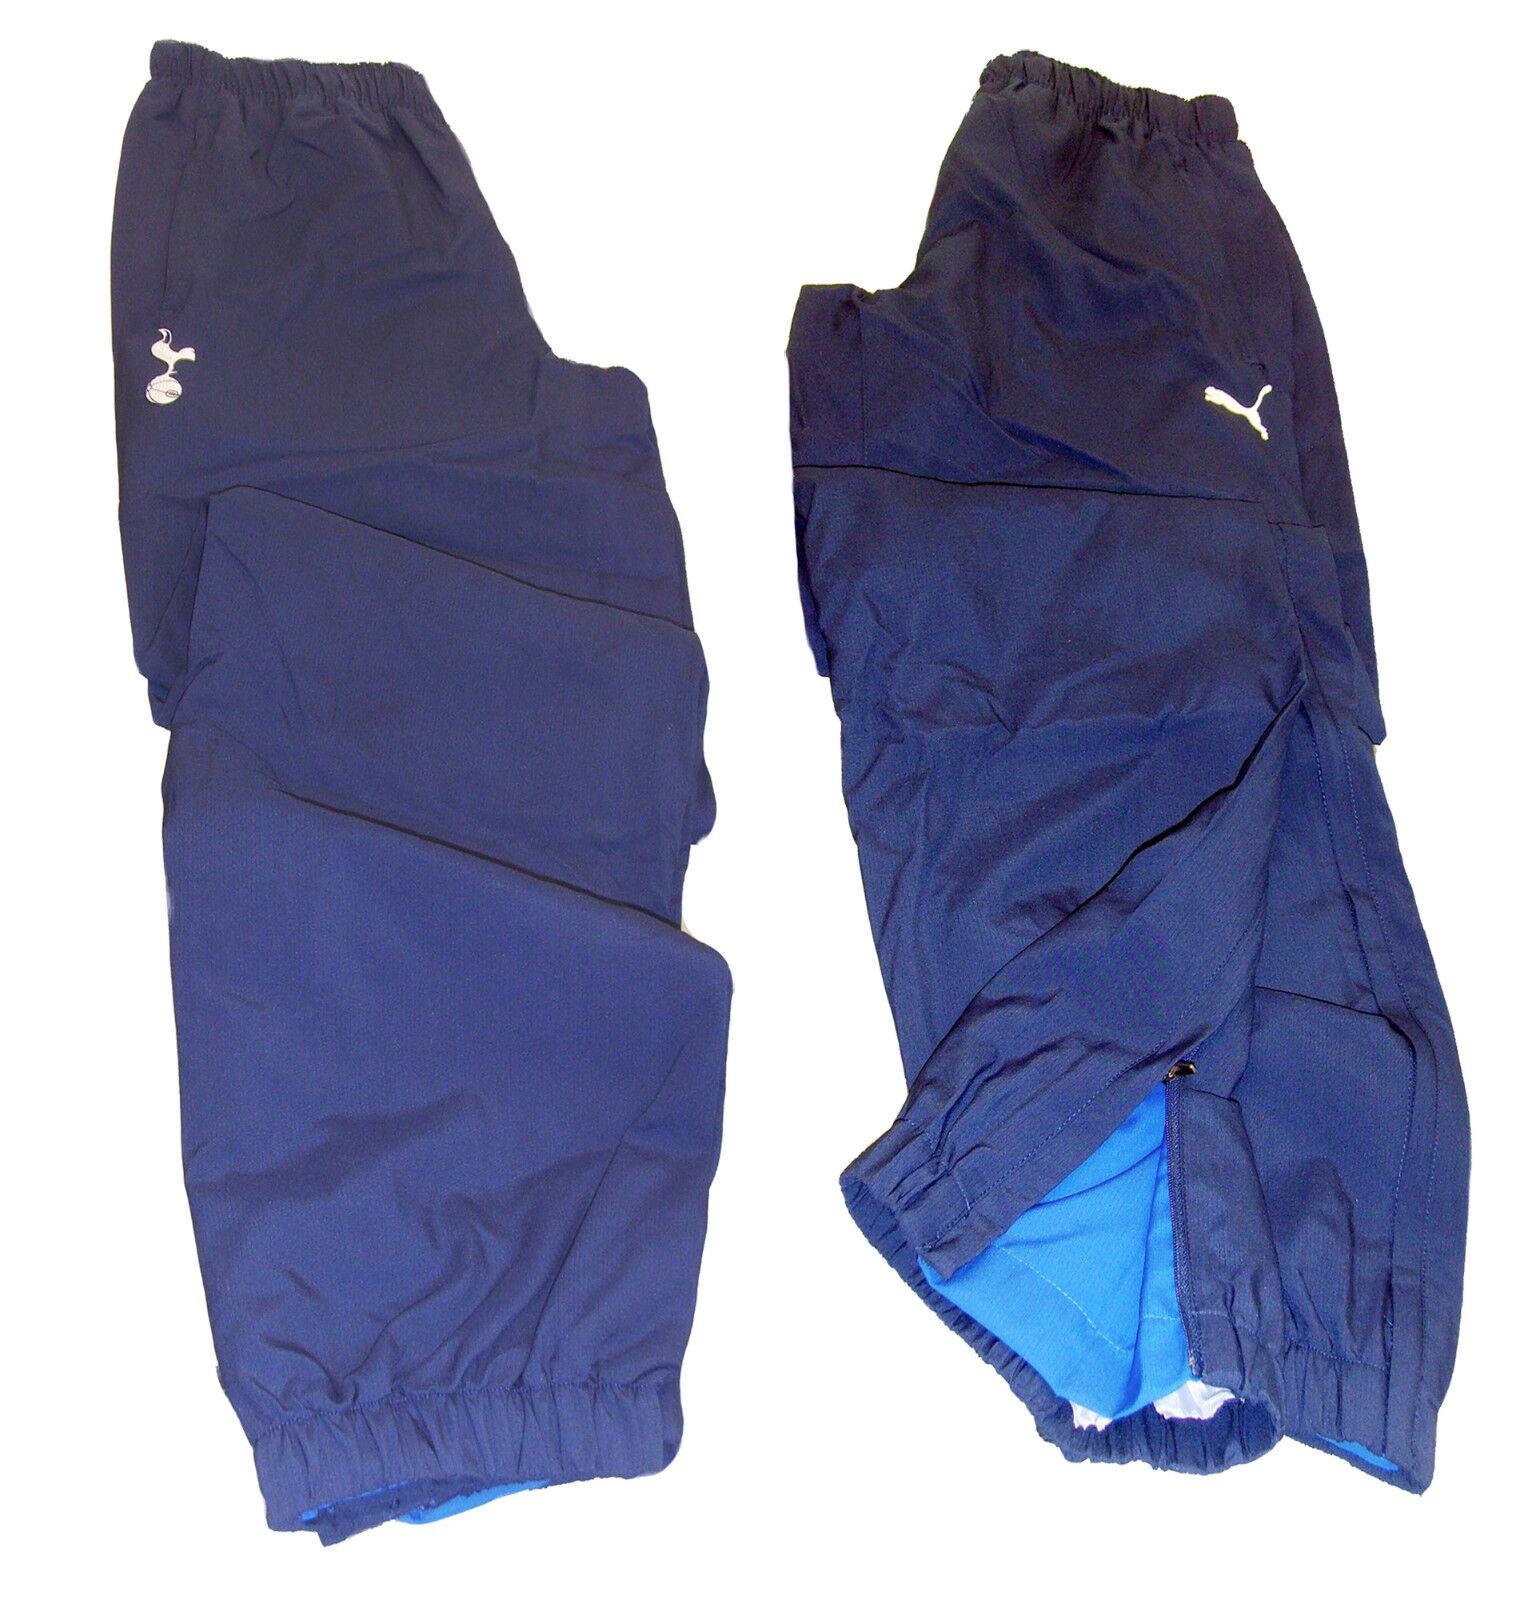 NEU Puma Herren Tottenham Hotspur Fußball Trainingsanzug Hose Blau XL